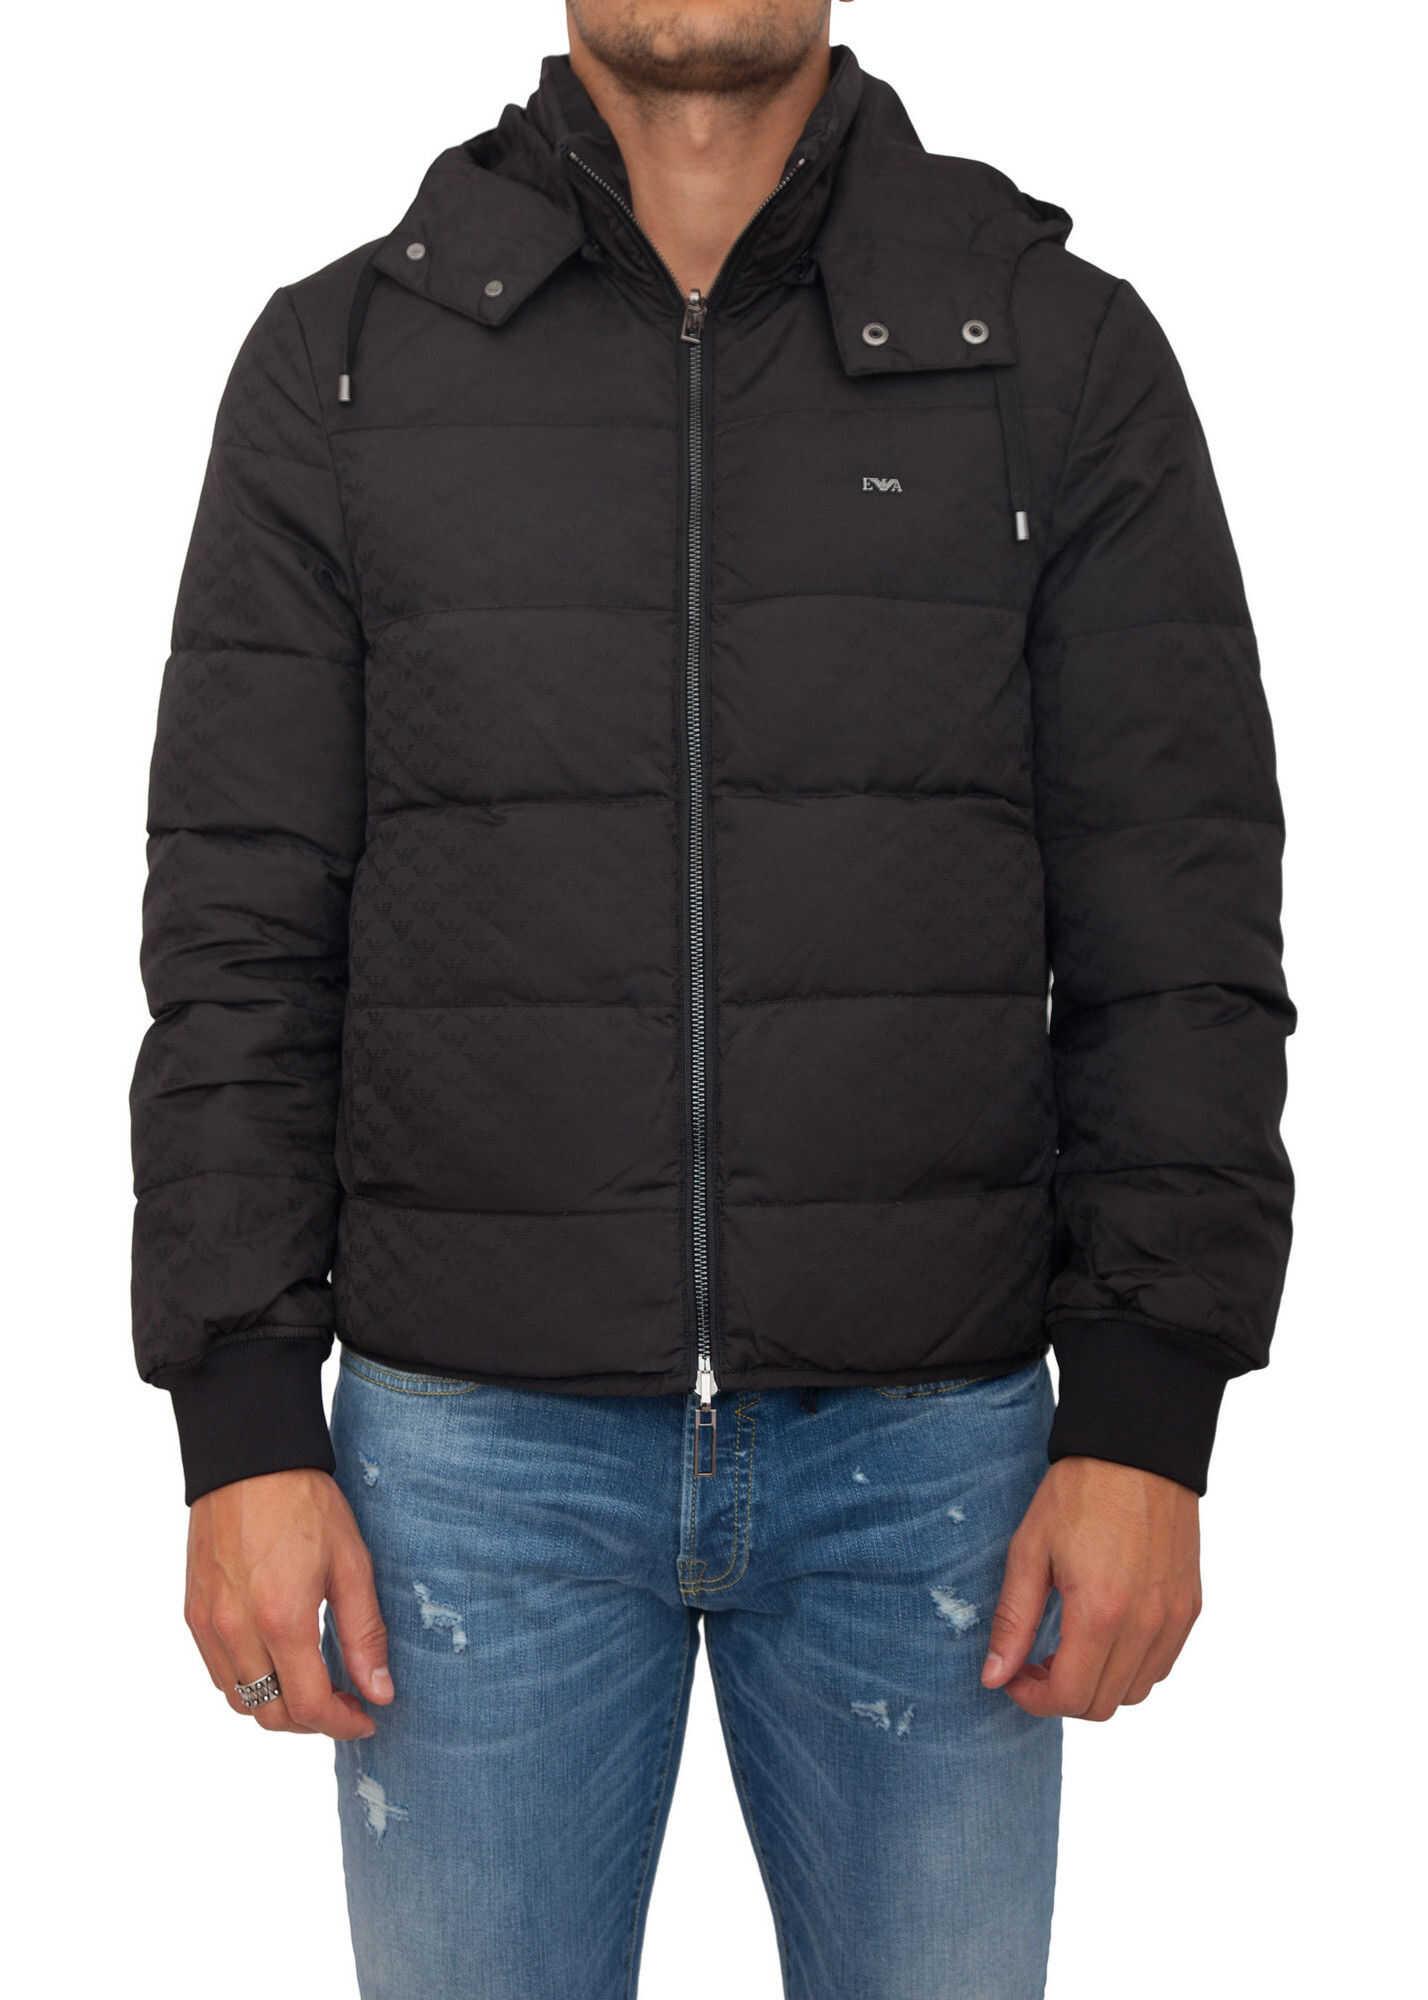 Emporio Armani 443C6BAE BLACK